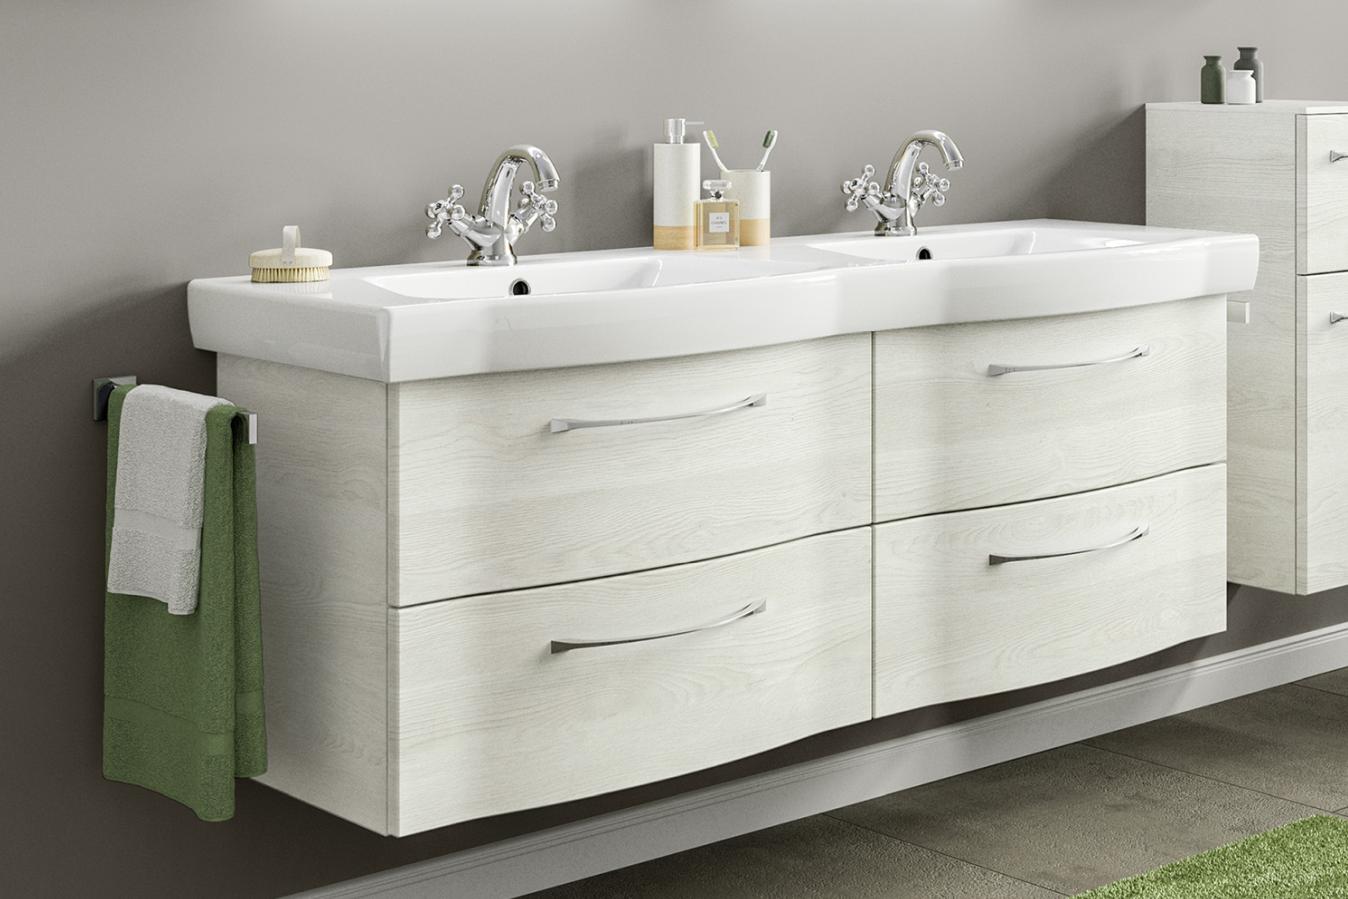 pelipal solitaire 6005 doppelwaschtisch mit unterschrank 137 cm breit badm bel 1. Black Bedroom Furniture Sets. Home Design Ideas